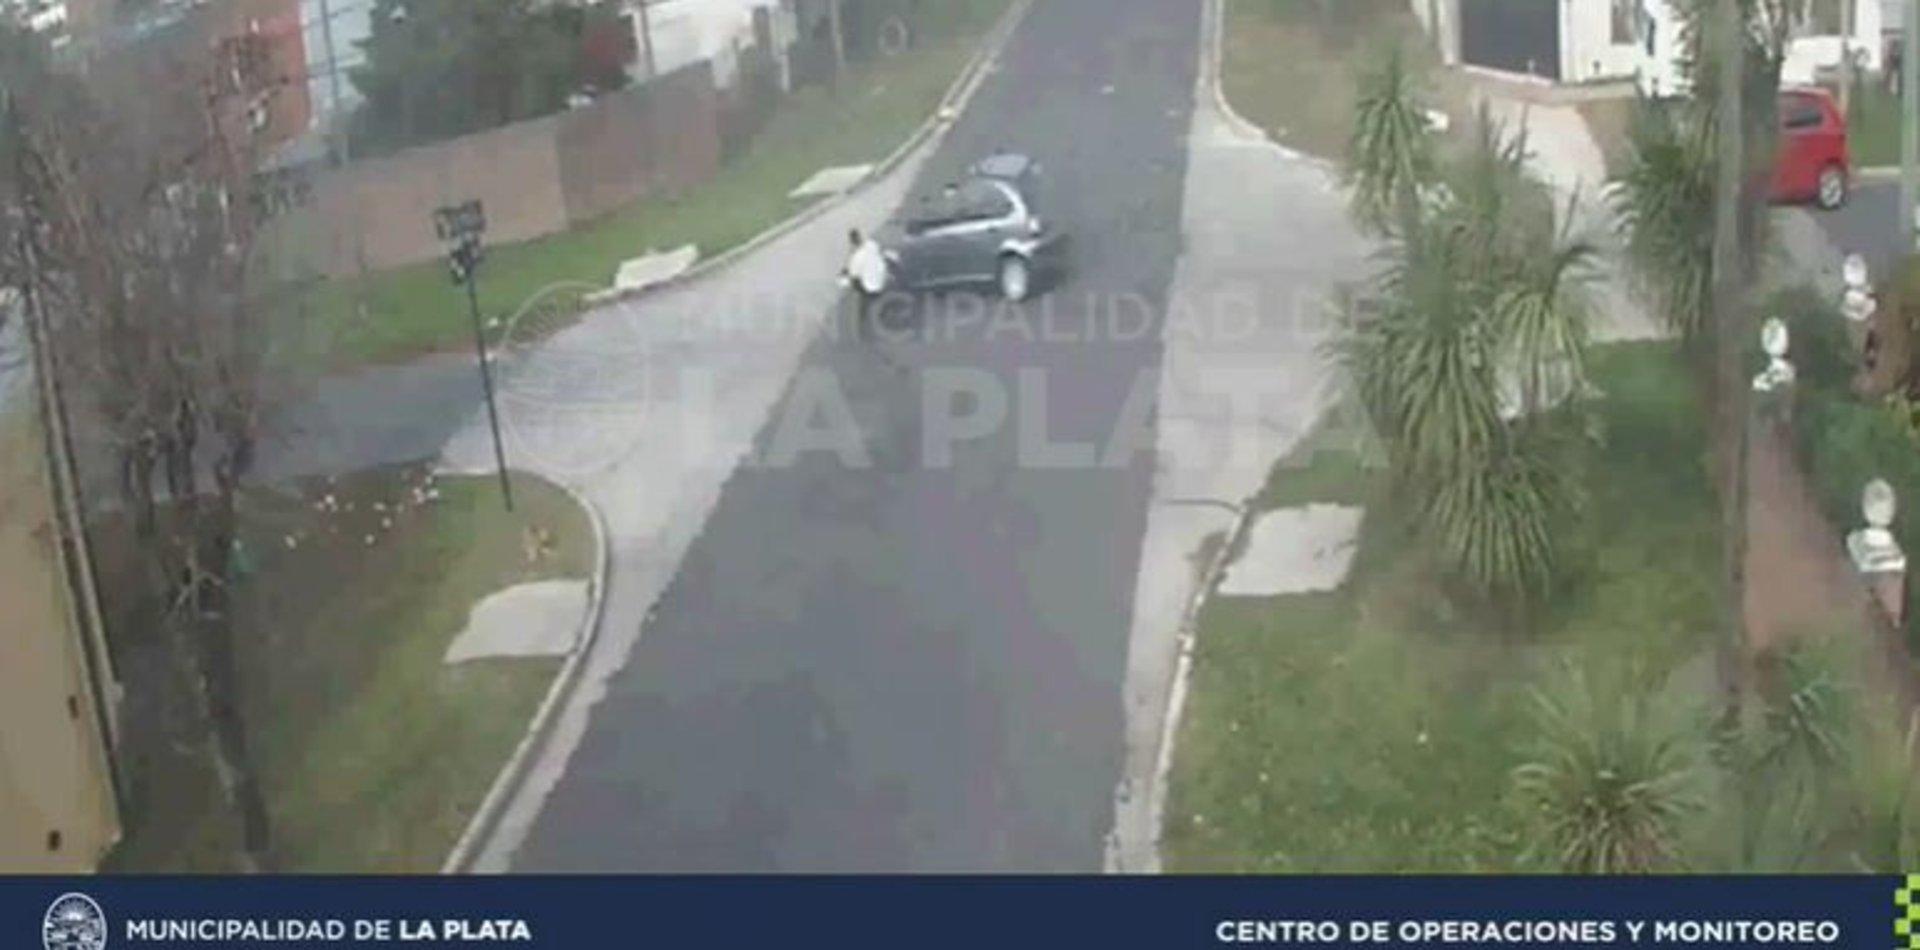 VIDEO: Un motociclista salió despedido tras chocar con un auto en Tolosa